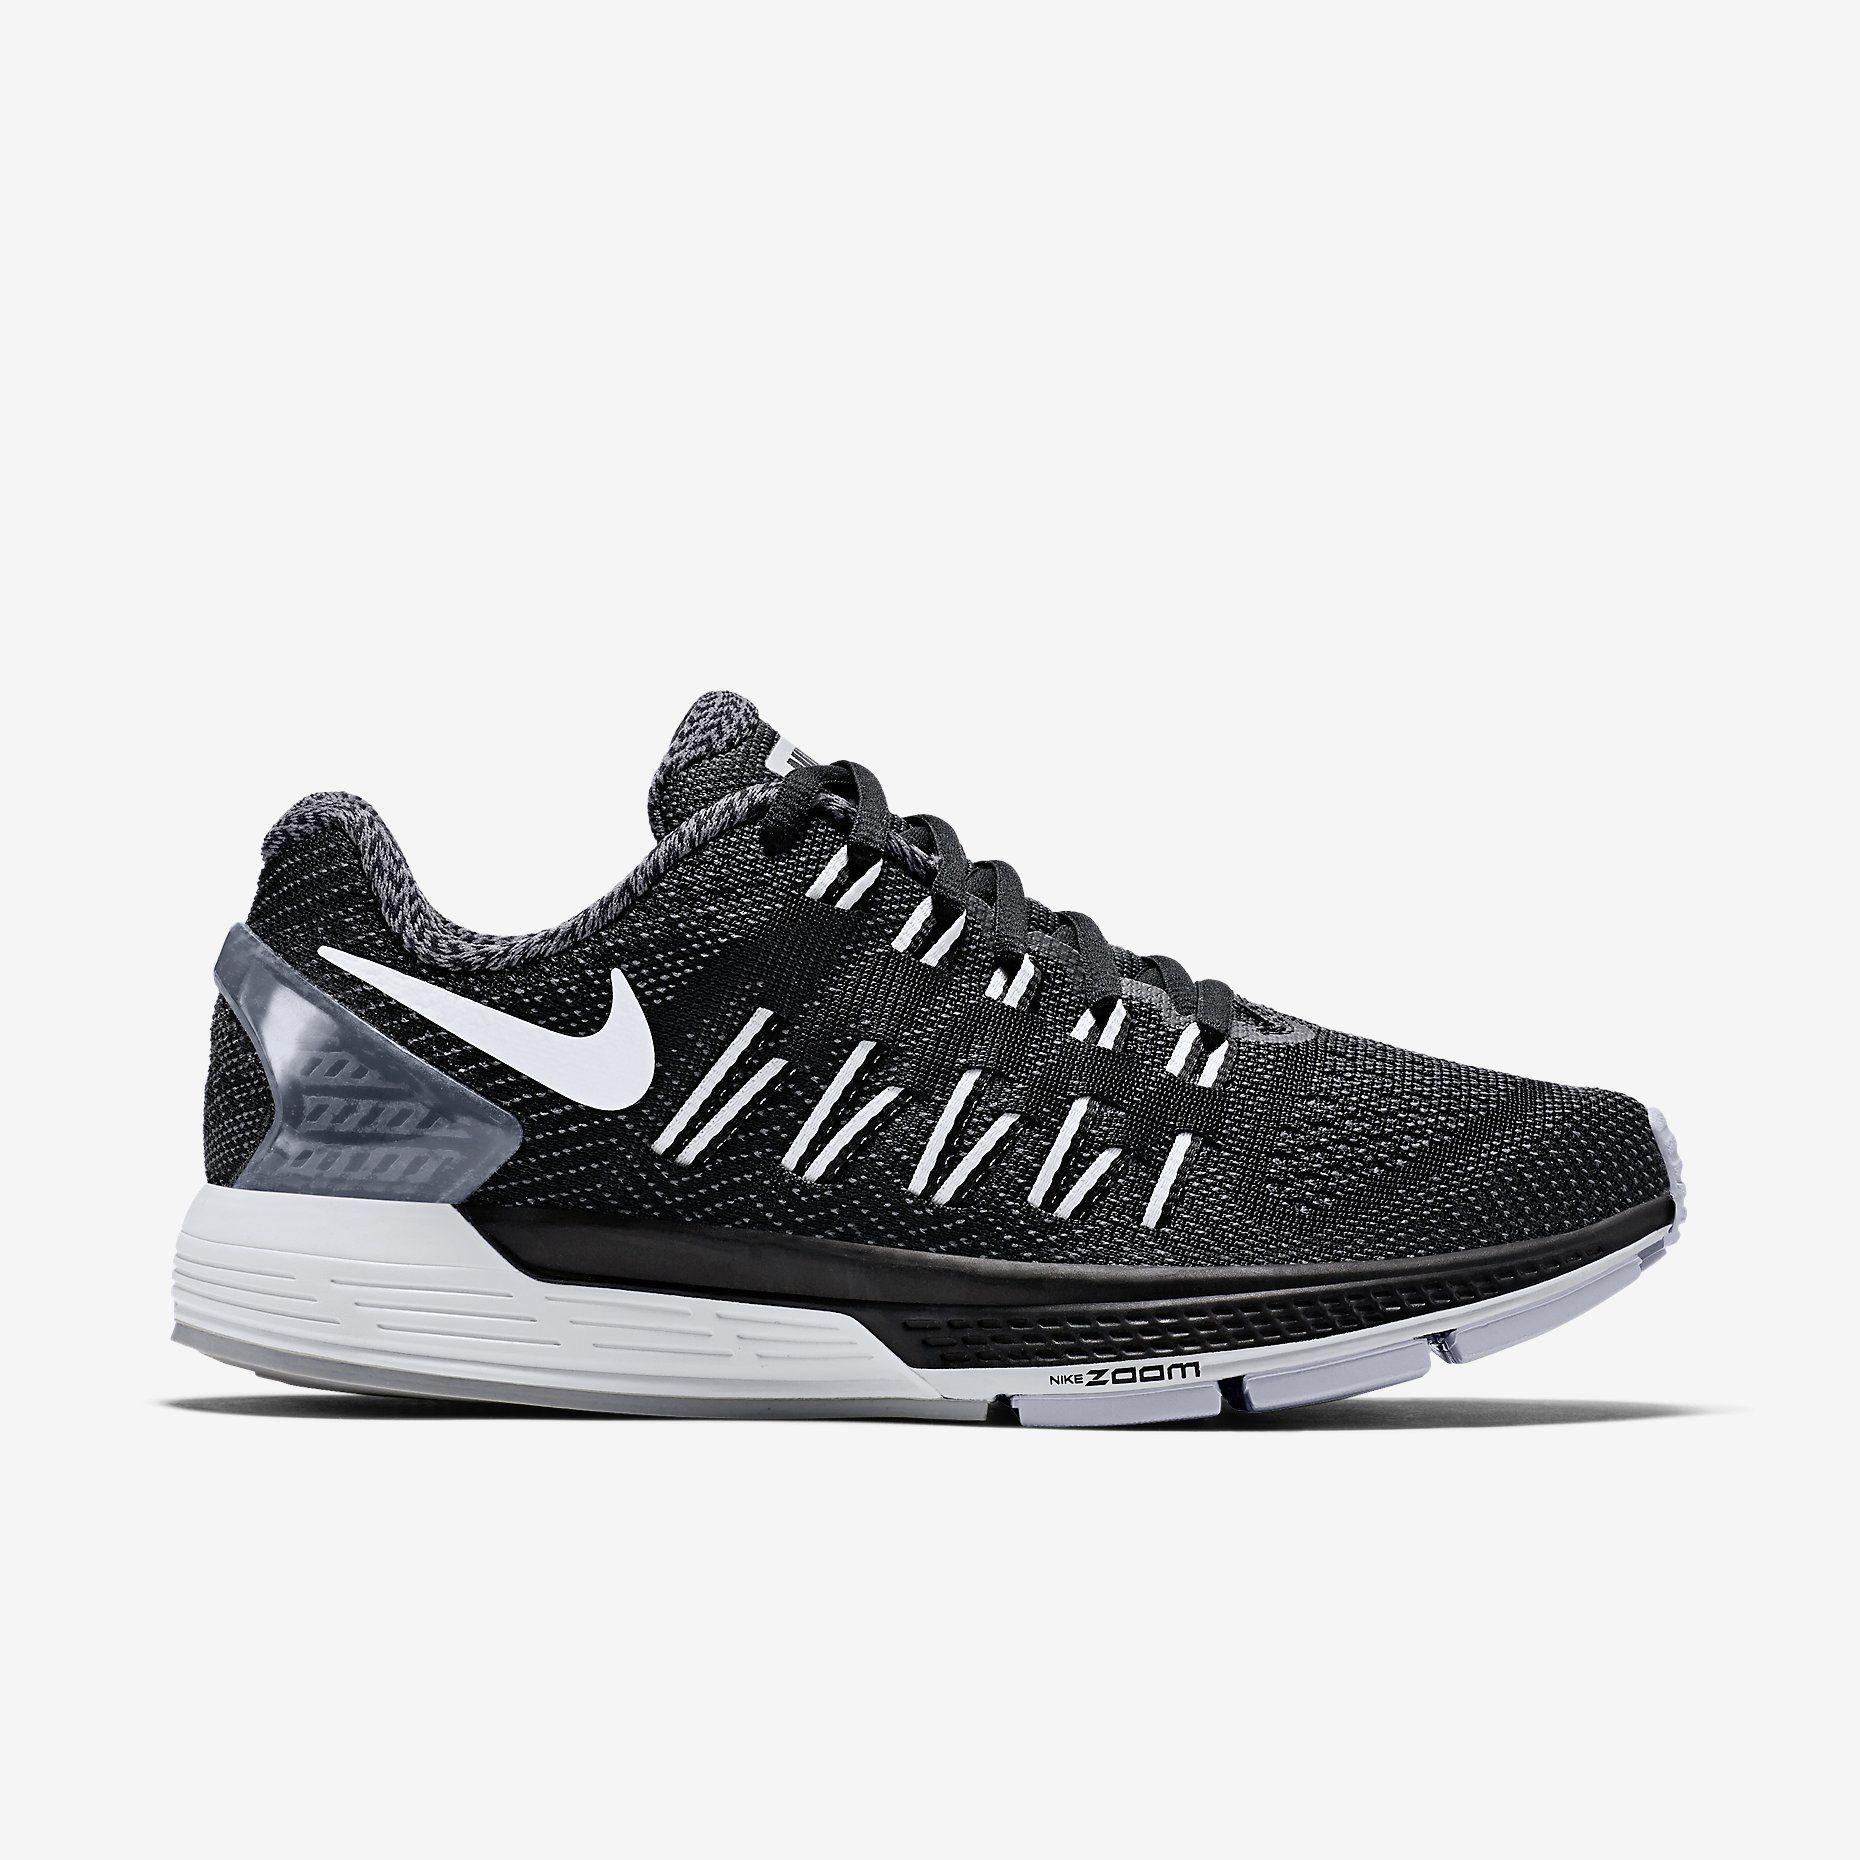 new styles 7c91d ff6c9 Nike Air Zoom Odyssey Hardloopschoen voor dames. Nike.com (BE) · Black Nike  Running ShoesWomen ...